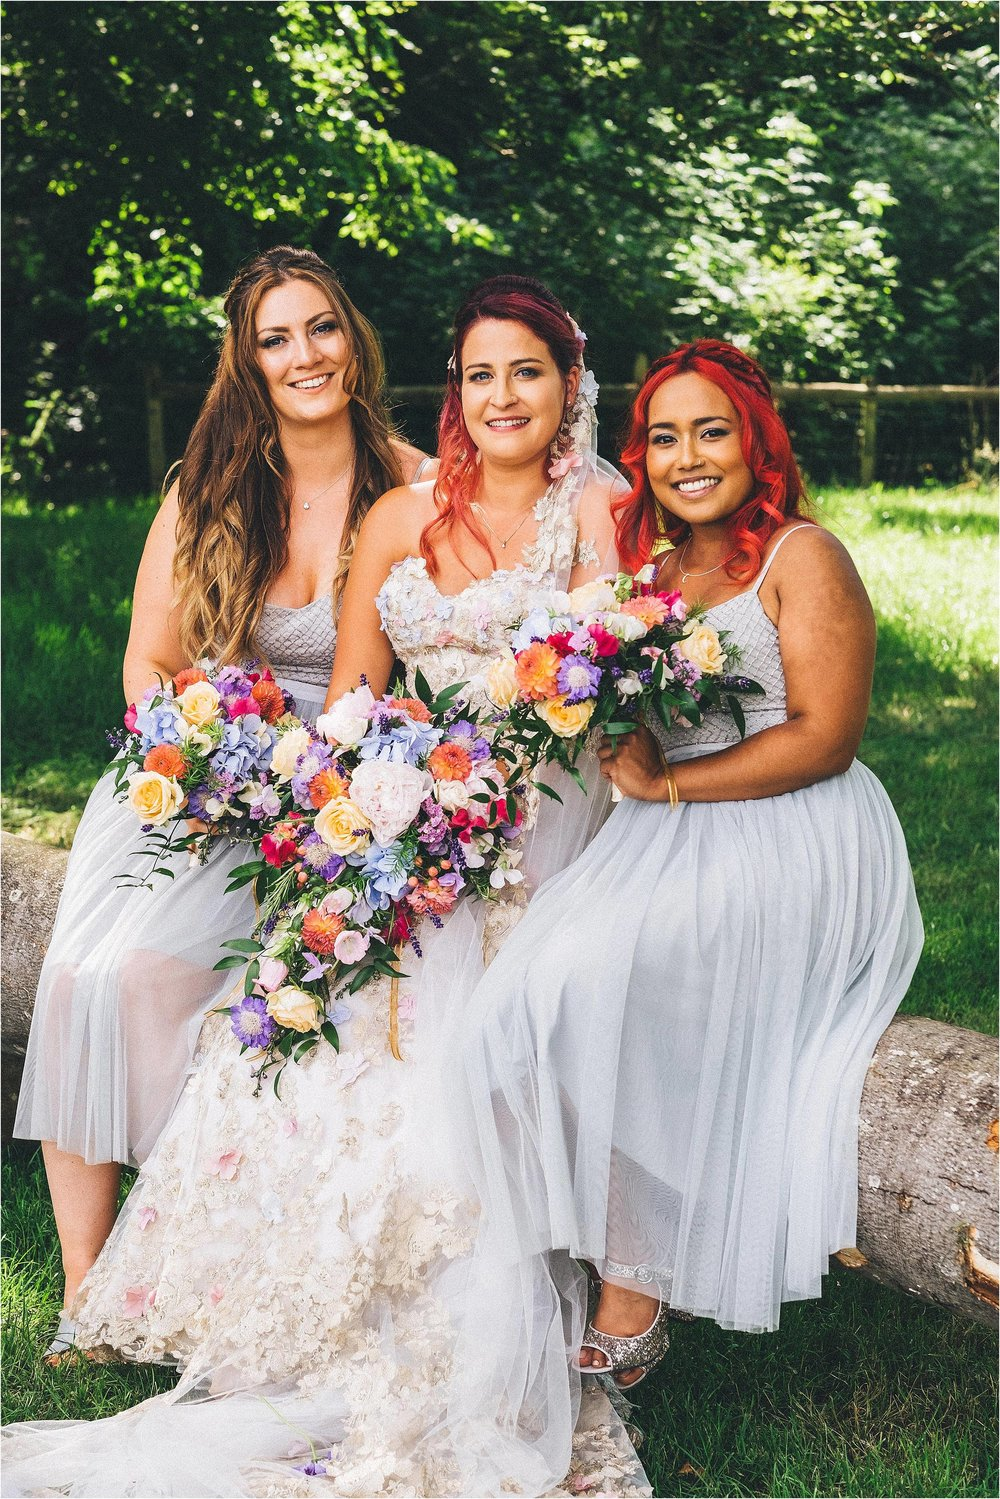 Milton Abbey Dorset Wedding Photographer_0121.jpg